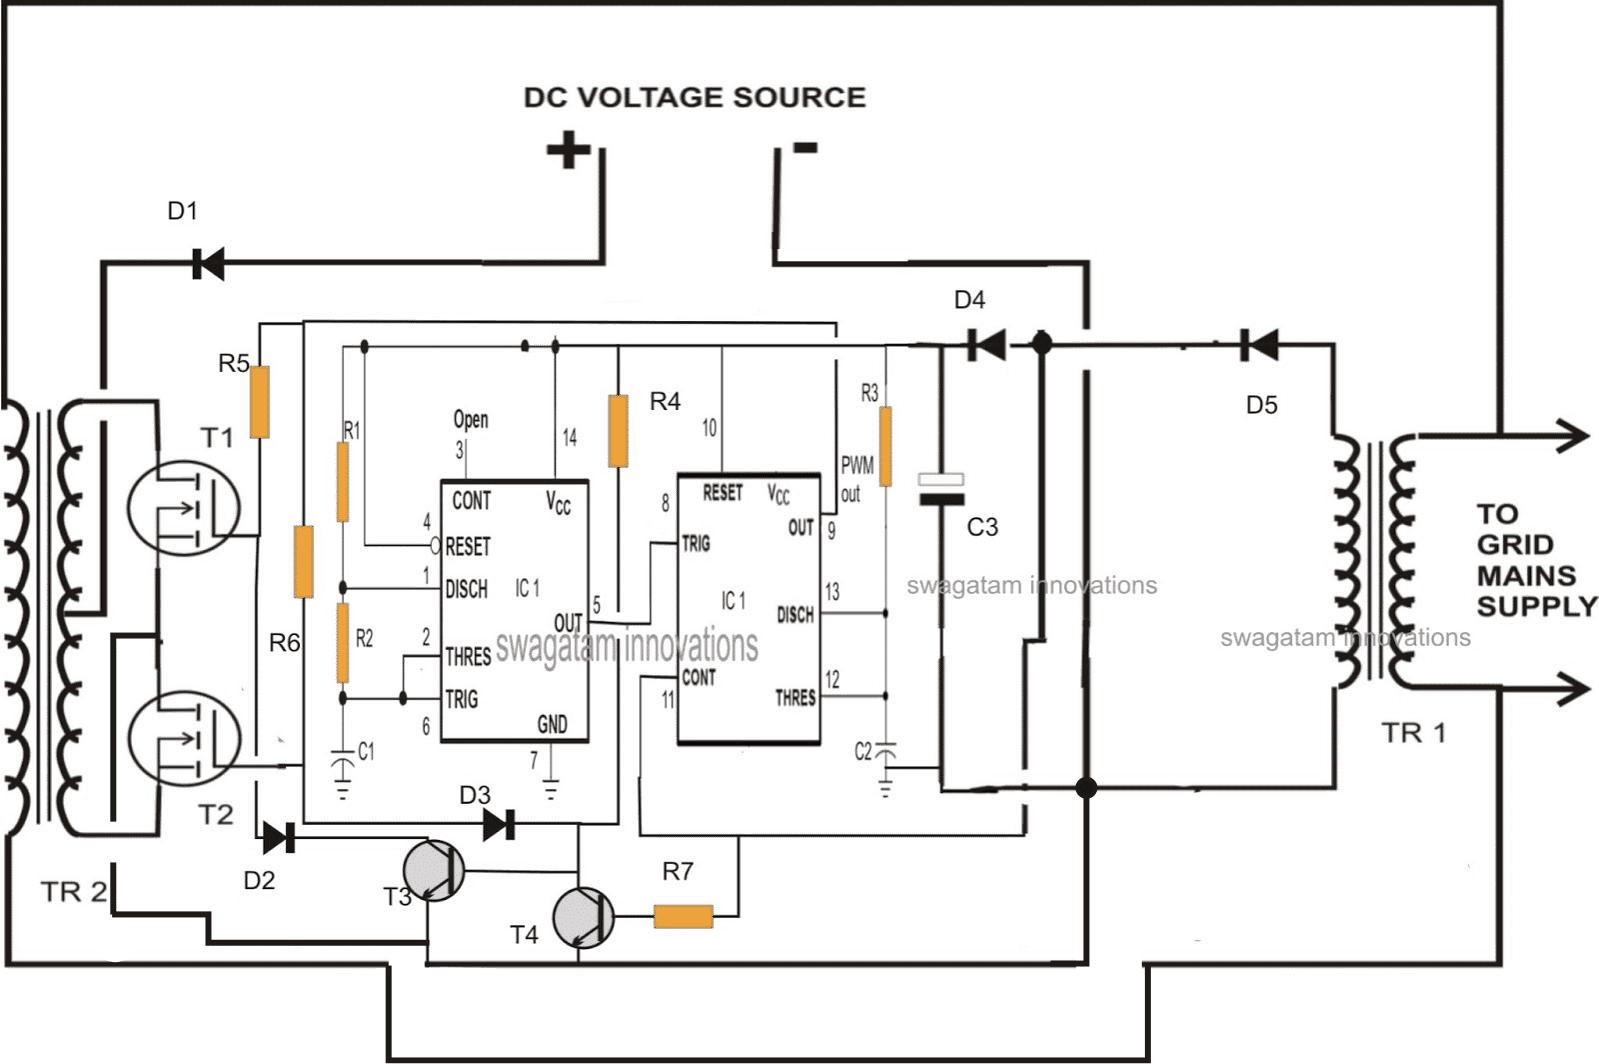 Grid Tie Power Inverter Wiring Diagram : 38 Wiring Diagram